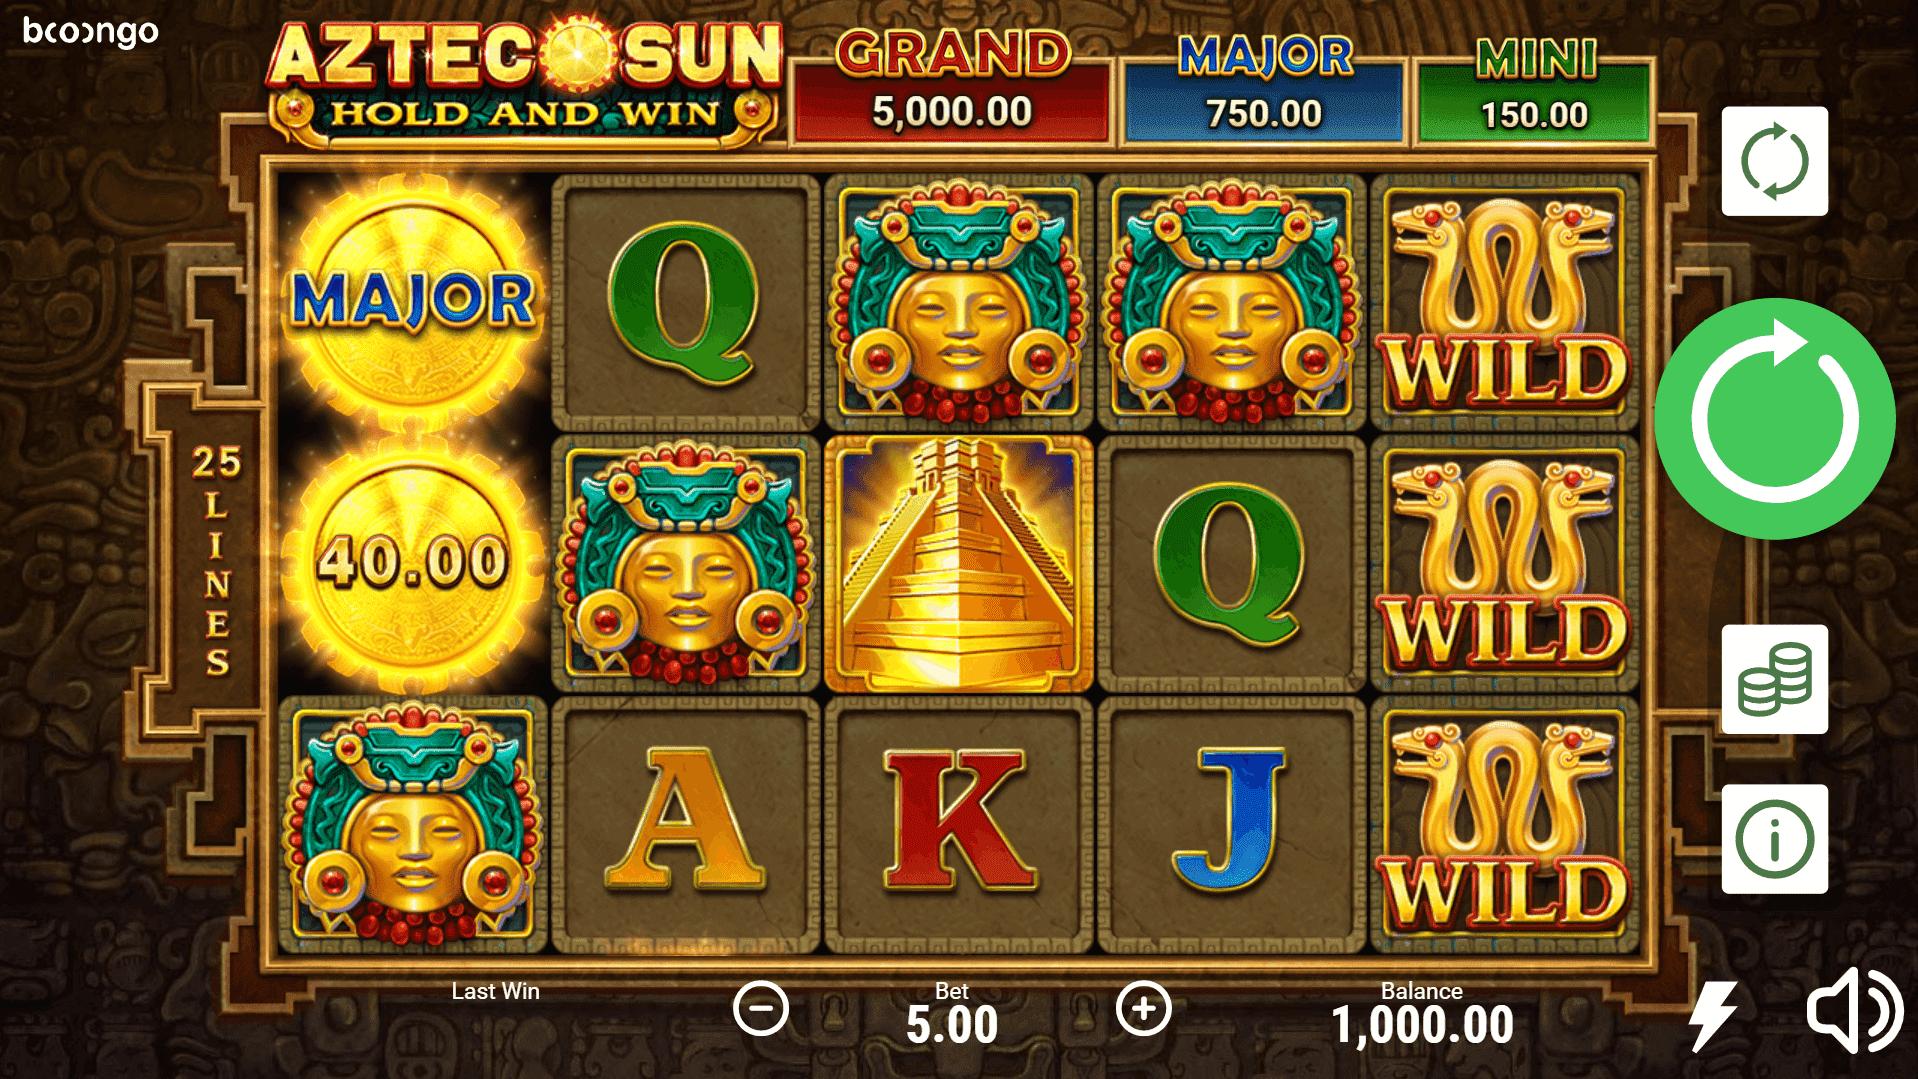 Aztec Sun Hold and Win slot machine screenshot